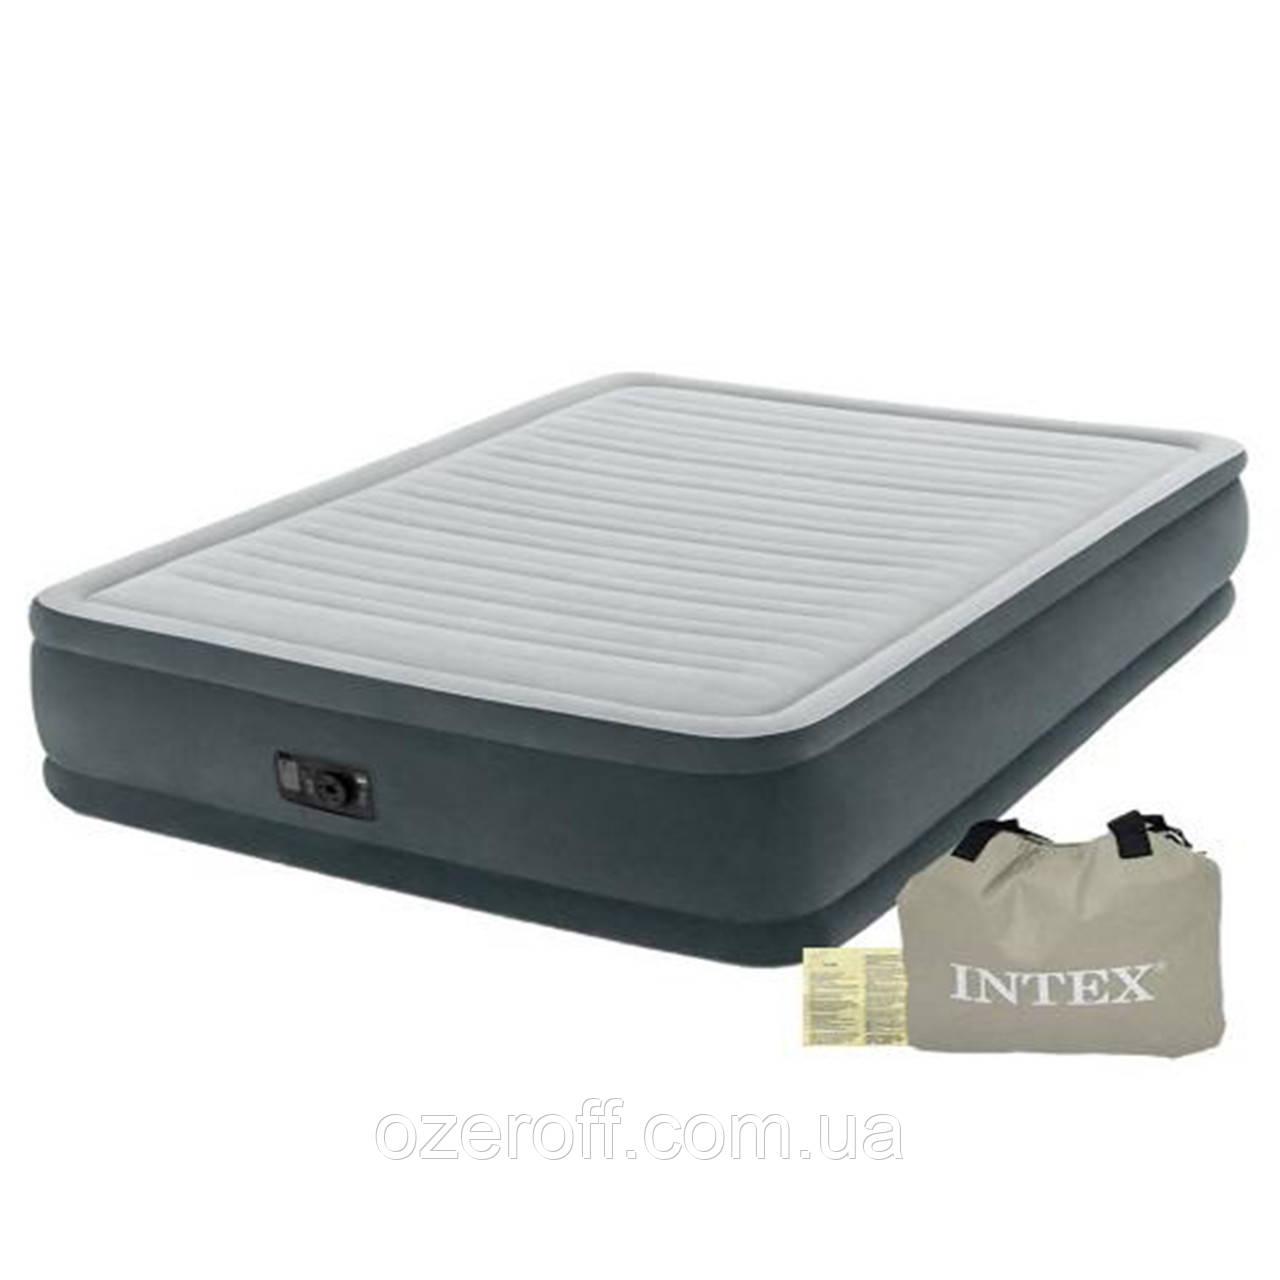 Надувне ліжко Intex 64126 з електронасосом 152 x 203 x 46 см